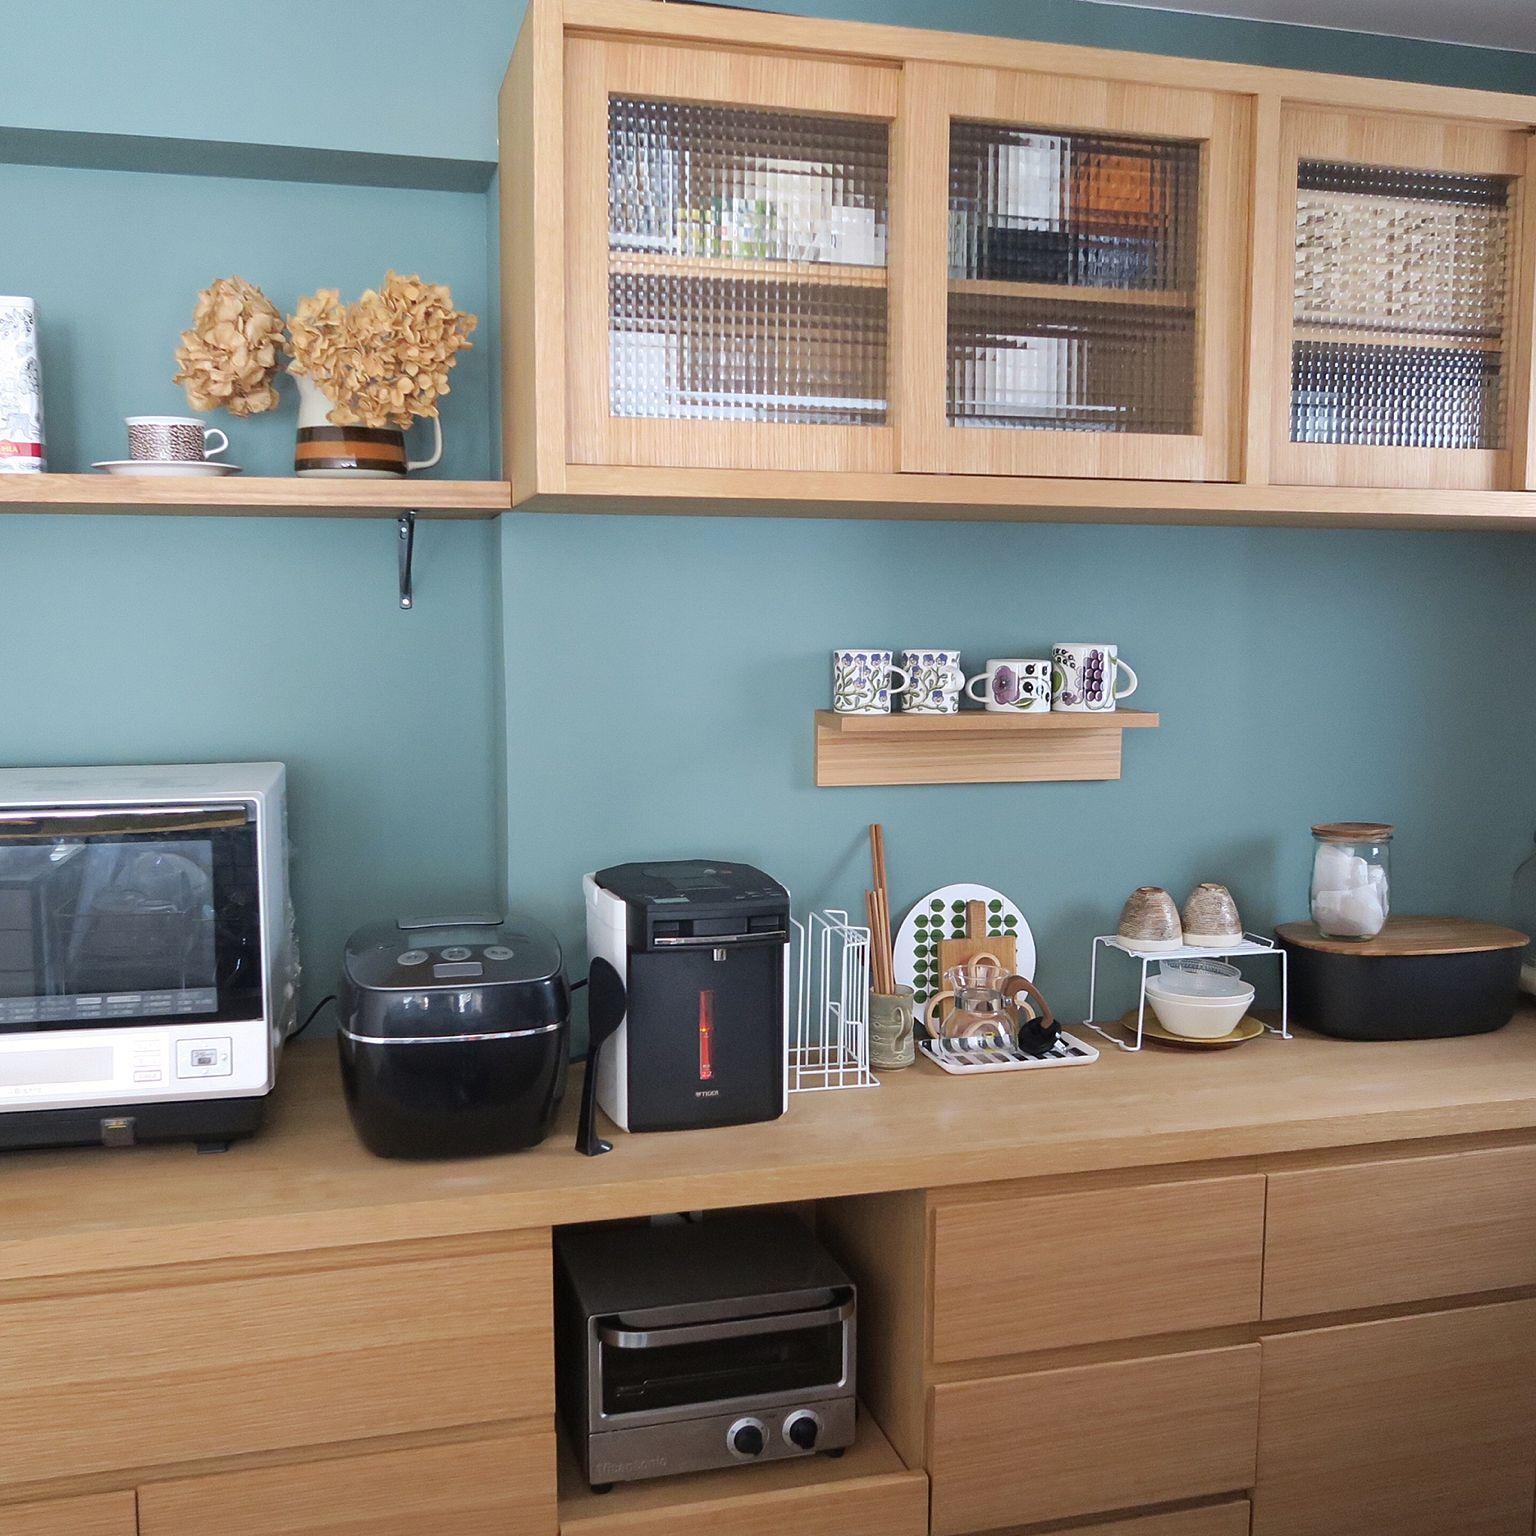 Kitchen Impossible 31 07: キッチン/キッチン収納/北欧/北欧インテリア/マンションインテリア...などのインテリア実例